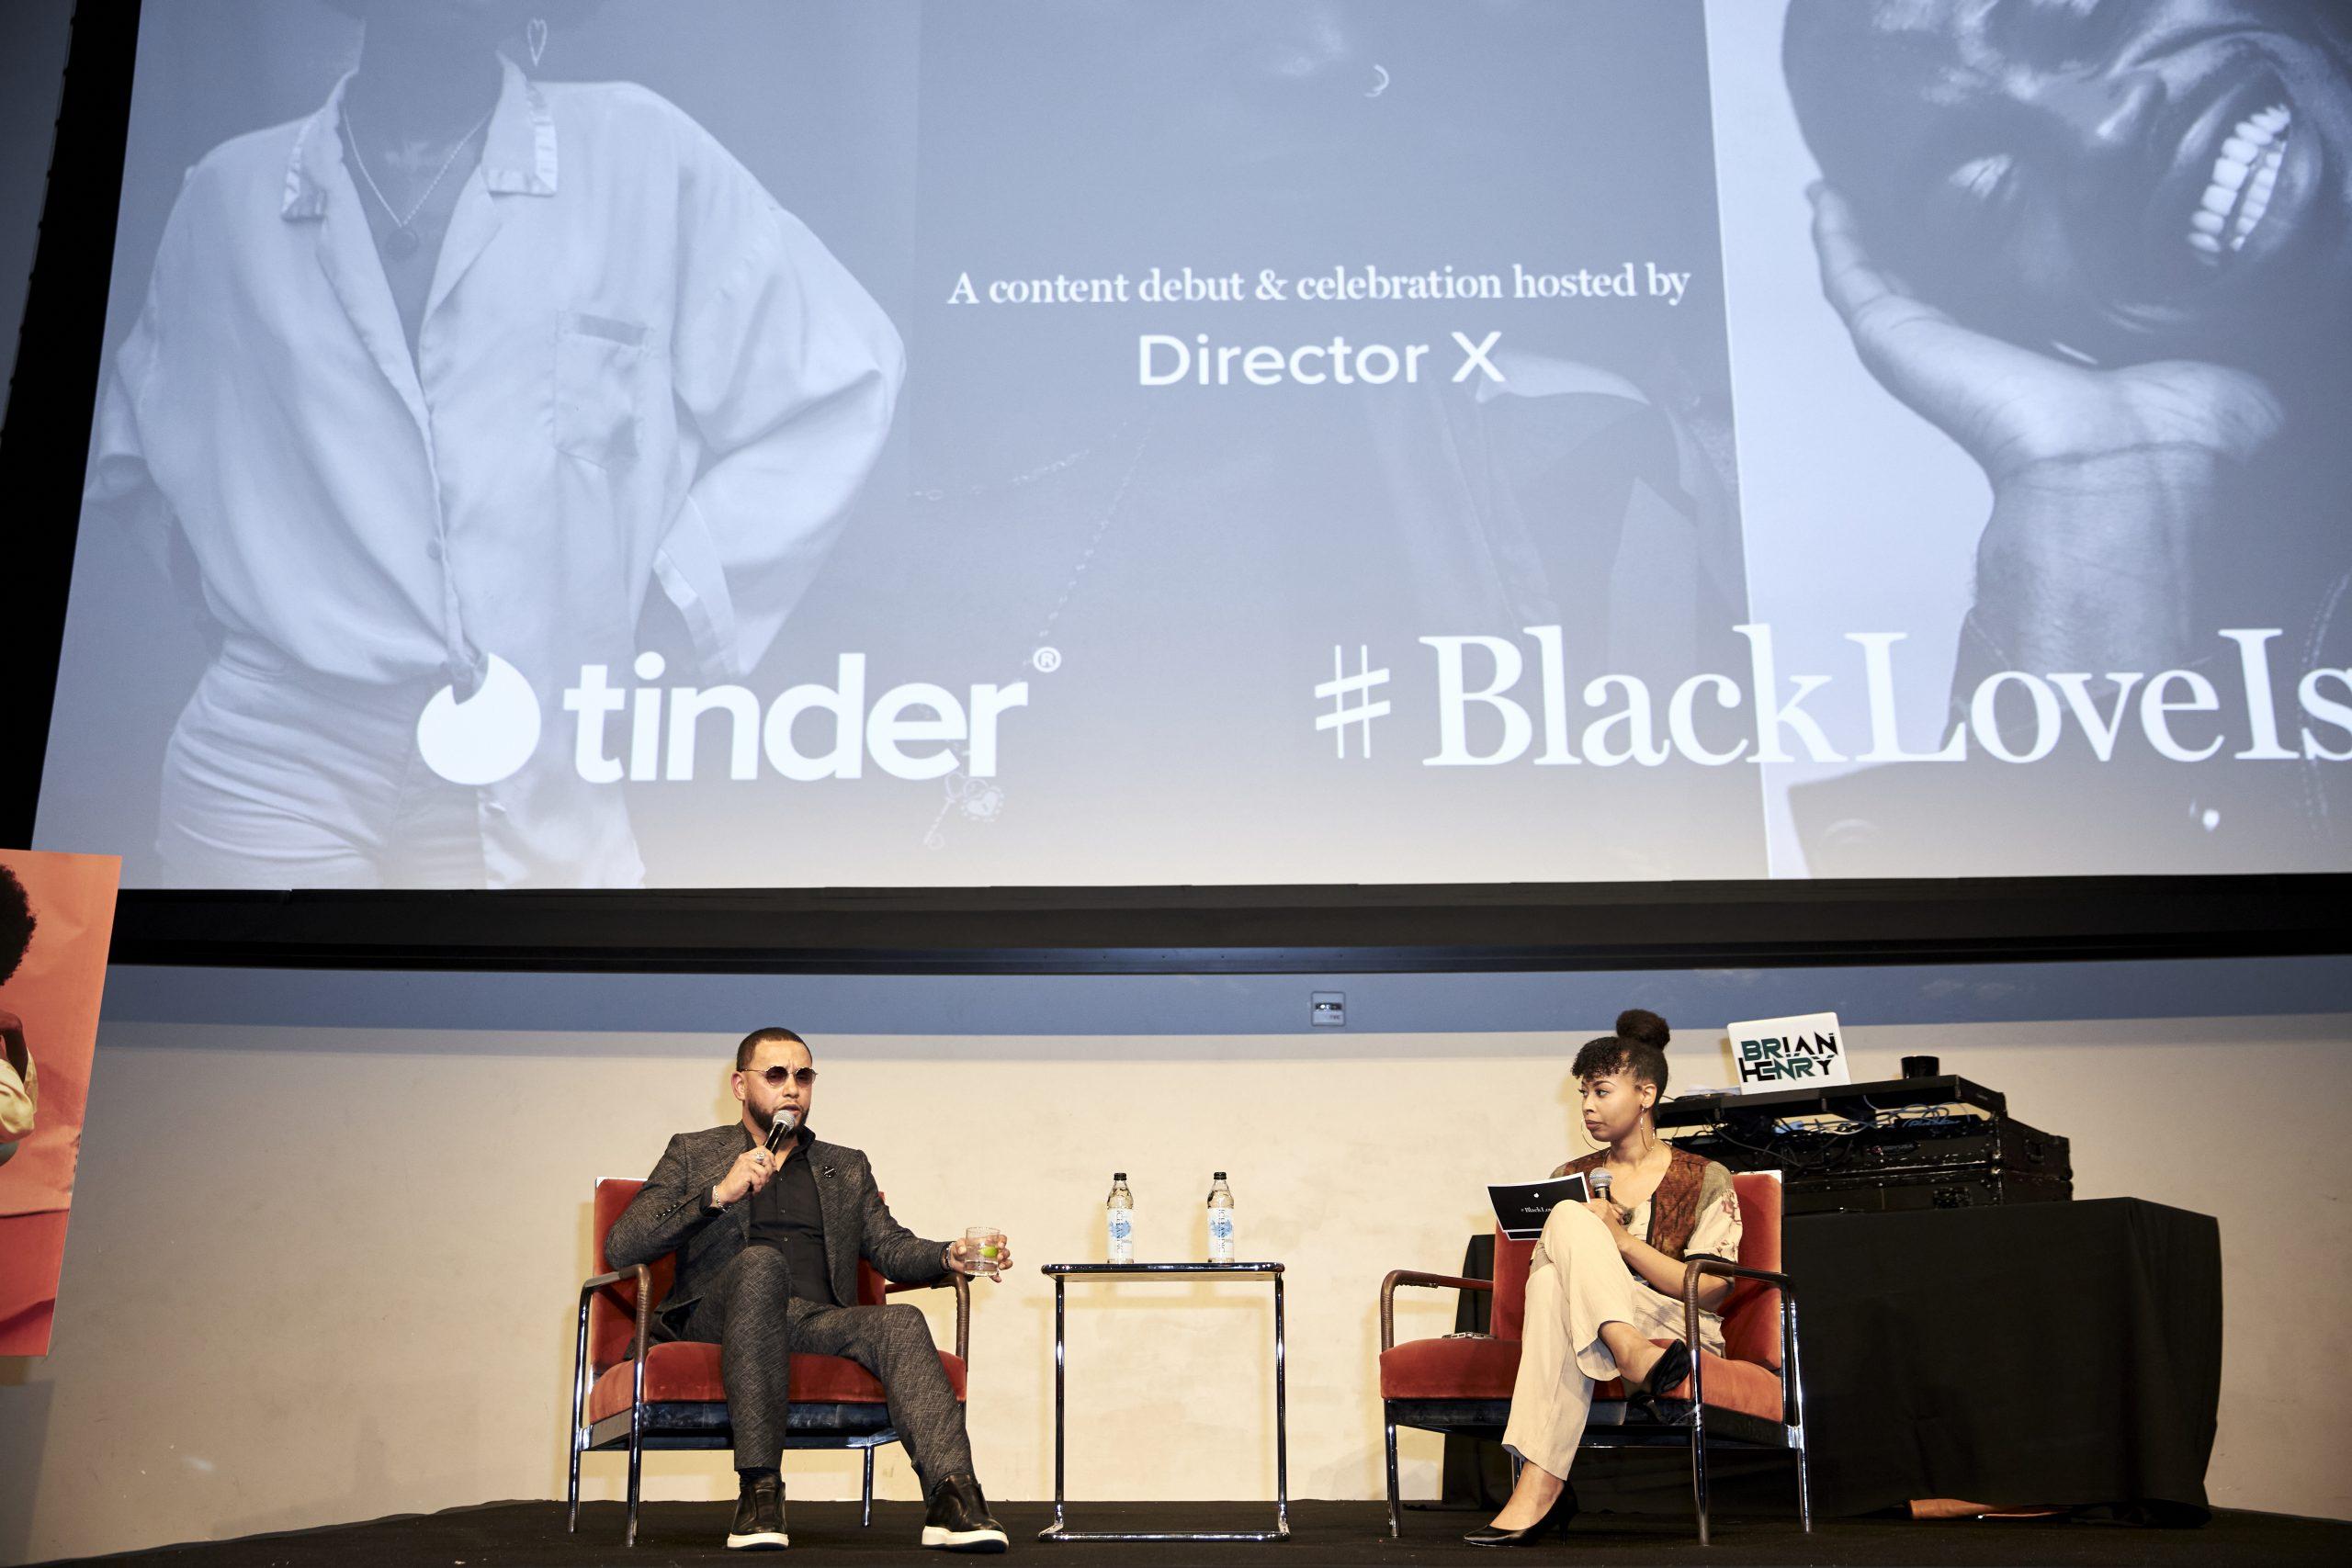 blackloveis, director x, tinder